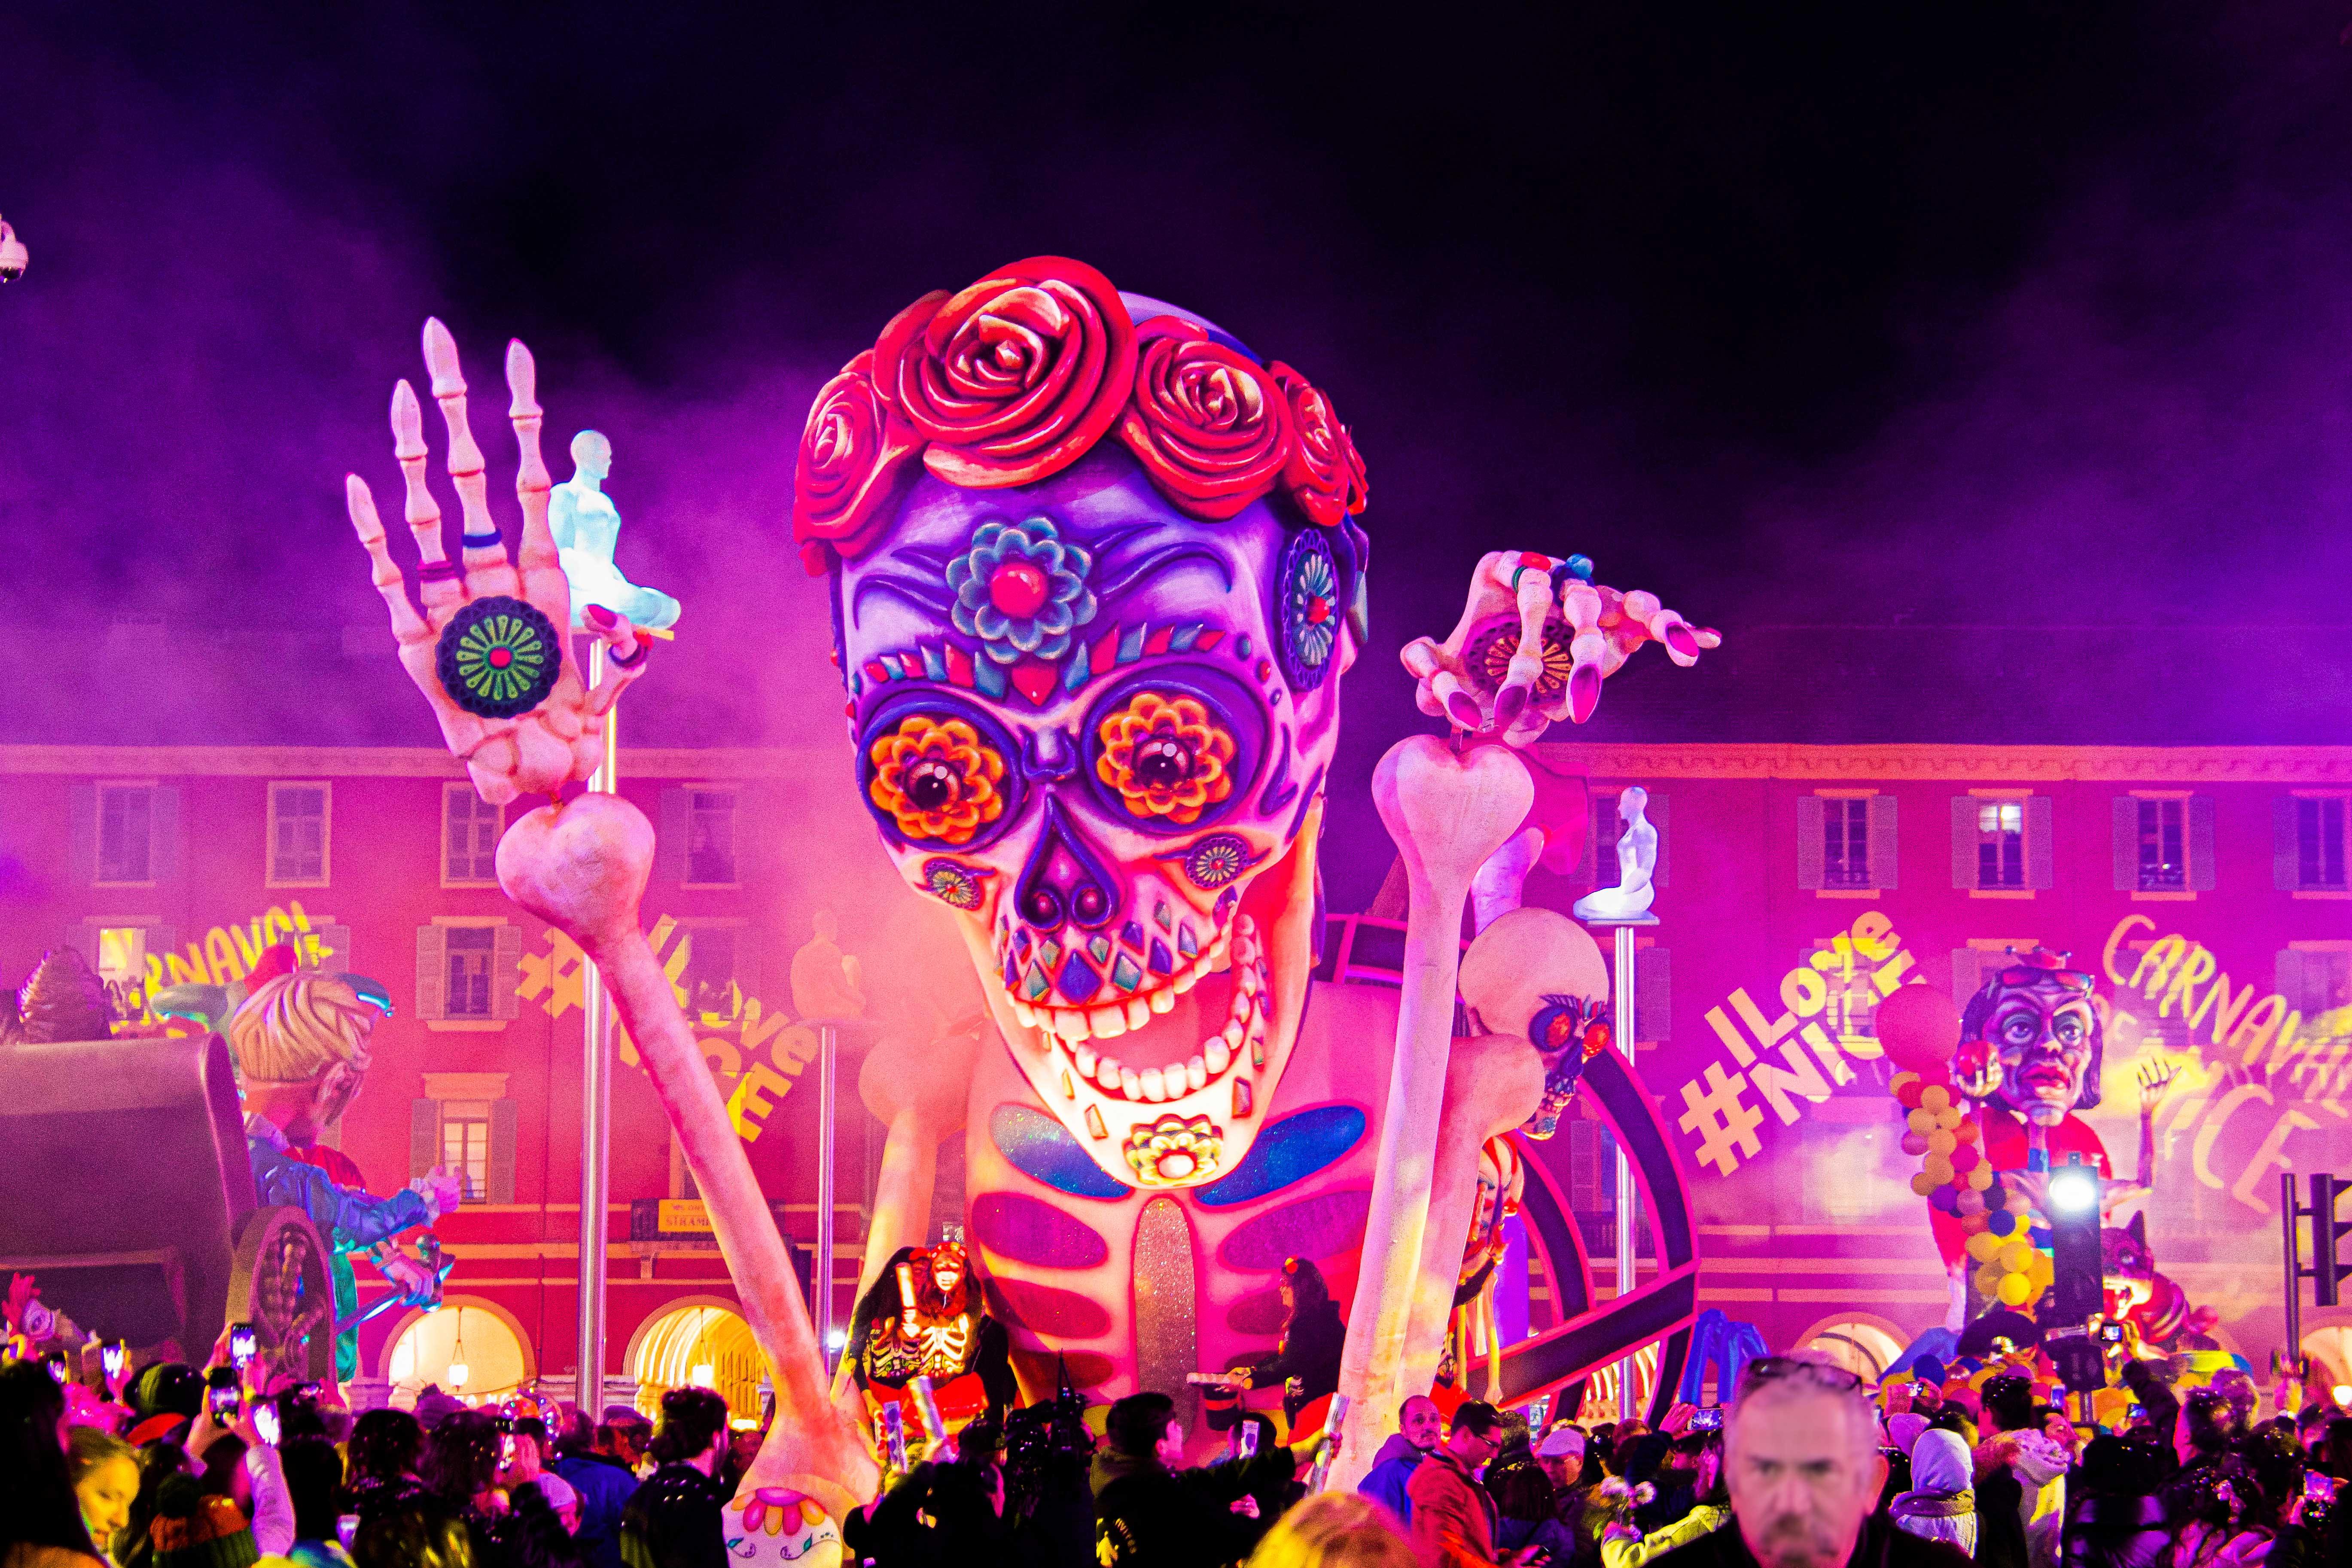 Le Carnaval de Nice 2020 - Crédit Summer Hotels